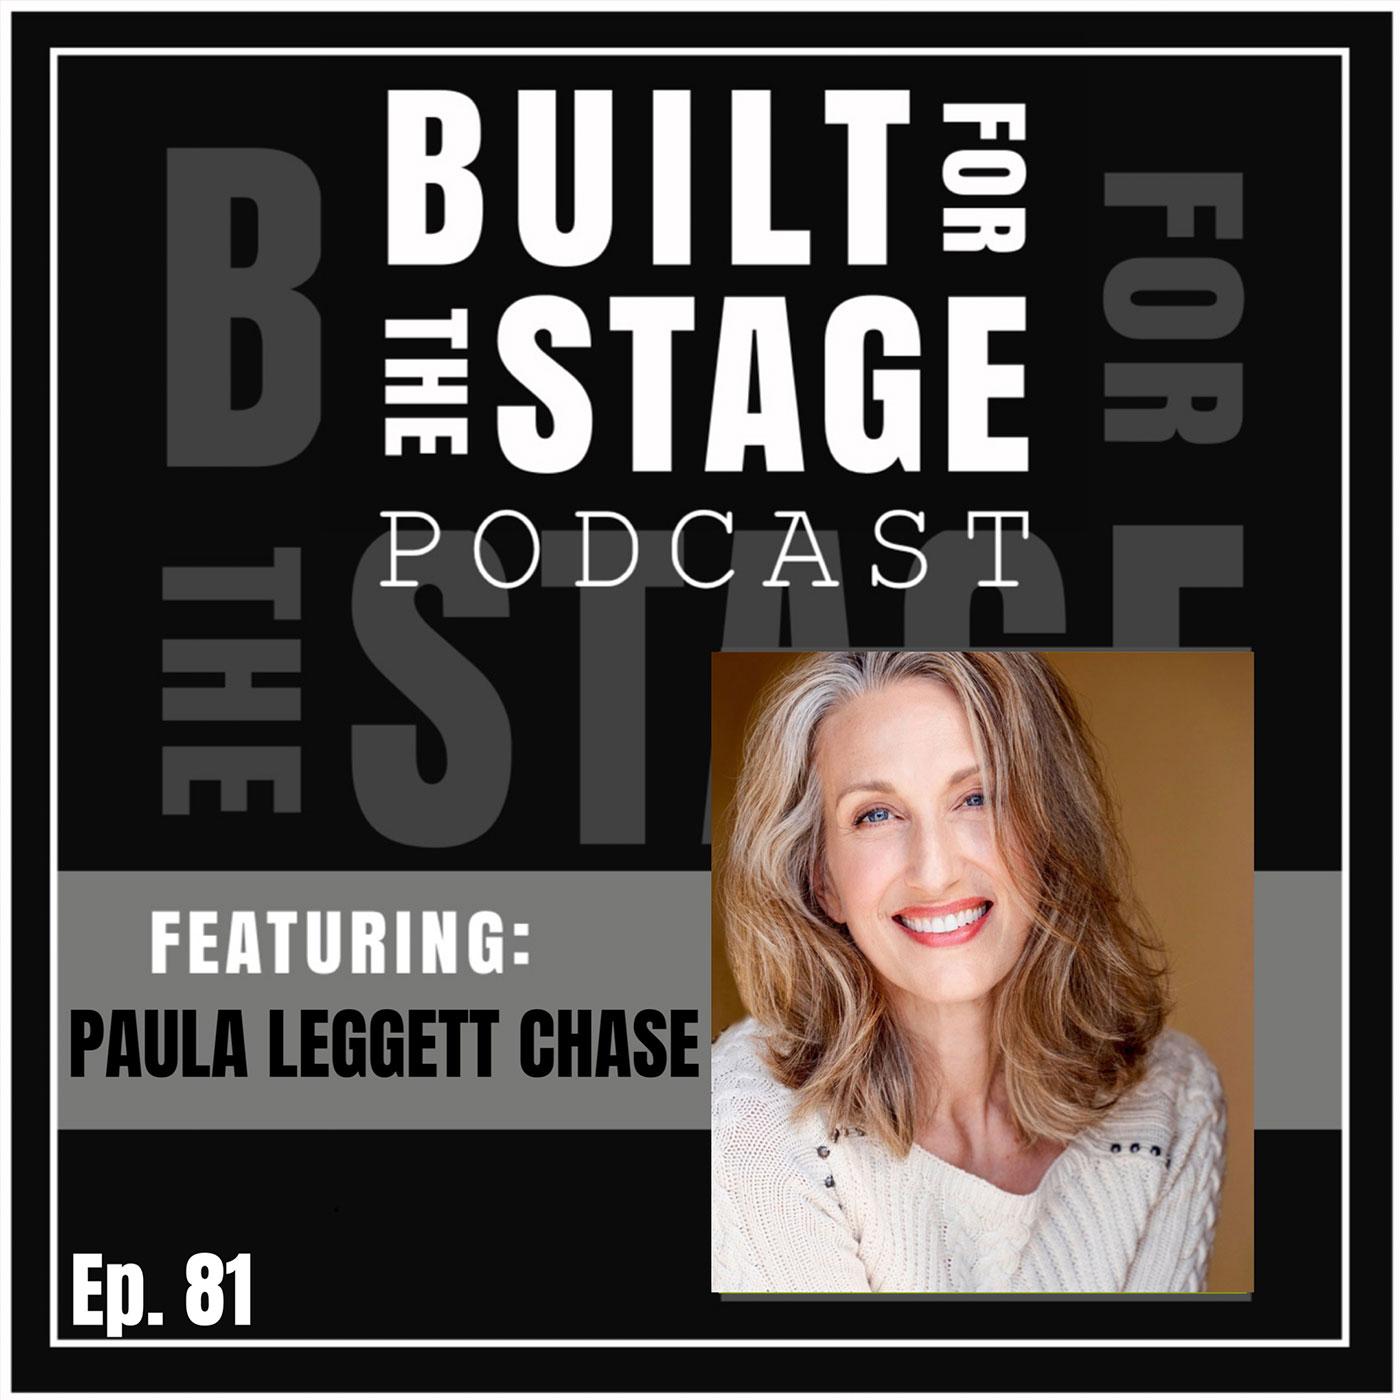 Built For The Stage Podcast - #81 - Paula Leggett Chase